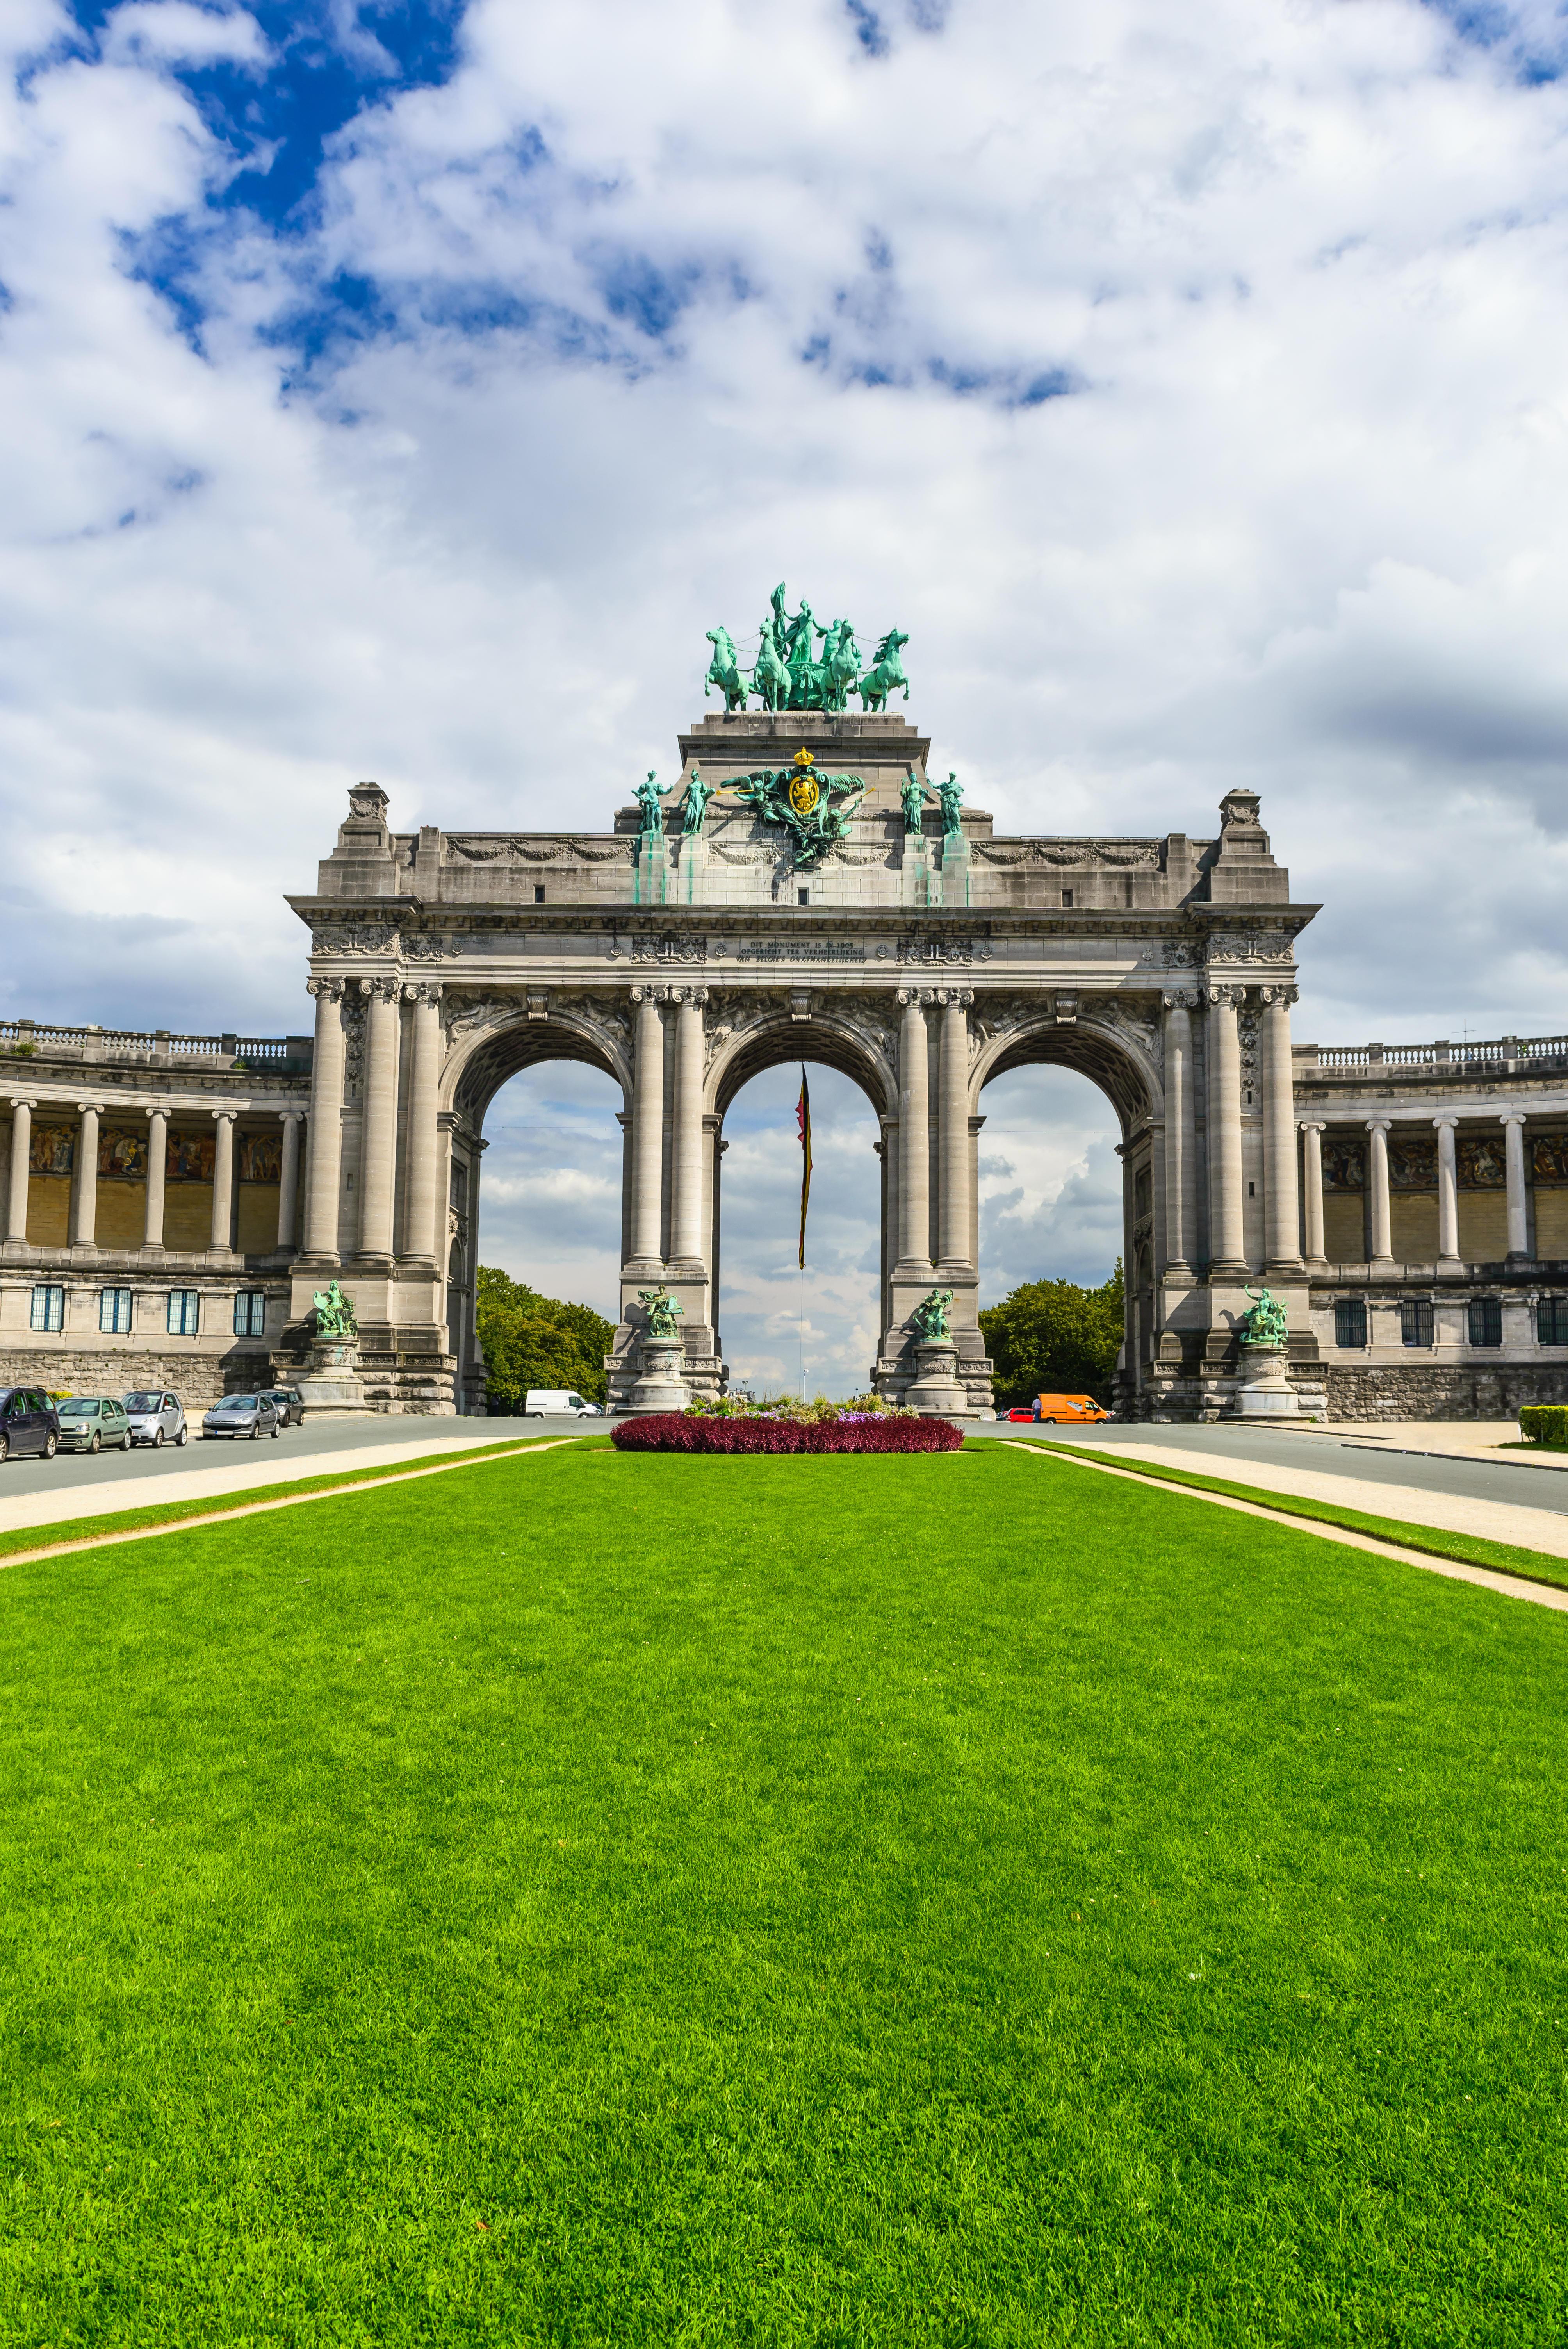 Bruxelles, Belgium. Parc du Cinquantenaire with Arch built for the Golden Jubilee celebrations of Belgian independence. Brussels